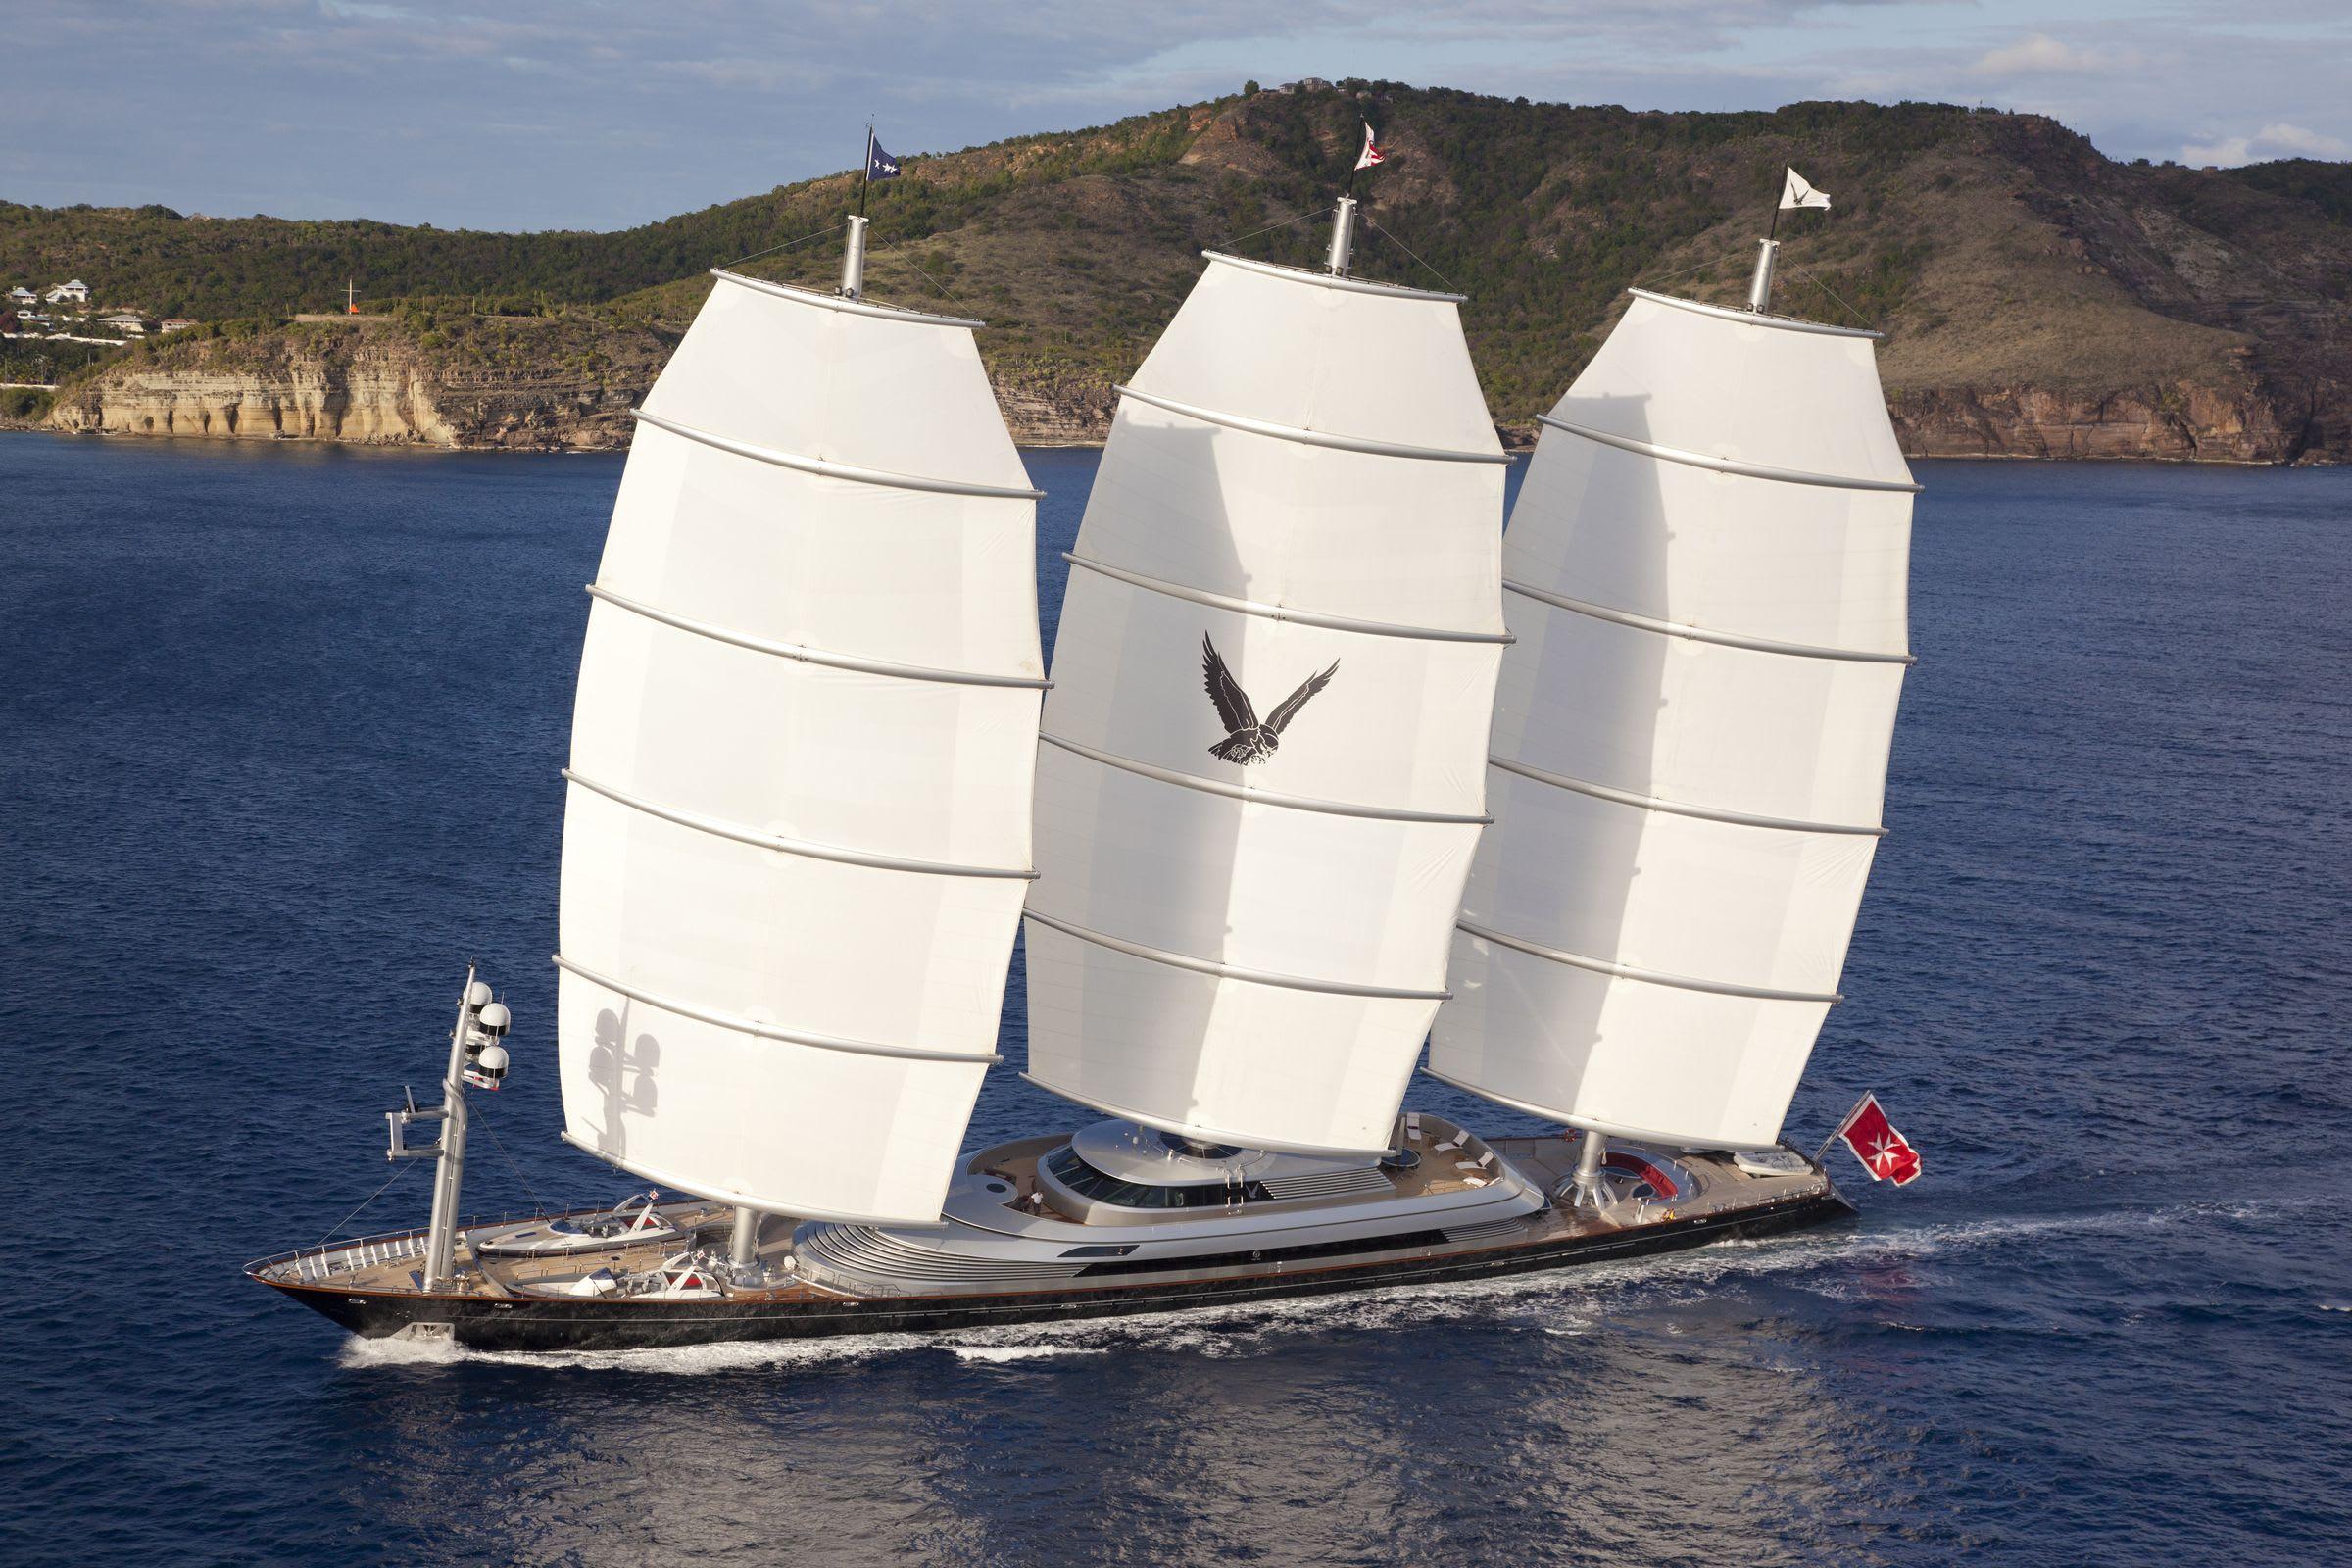 Image of Maltese Falcon 88.0M (288.7FT) sailing yacht